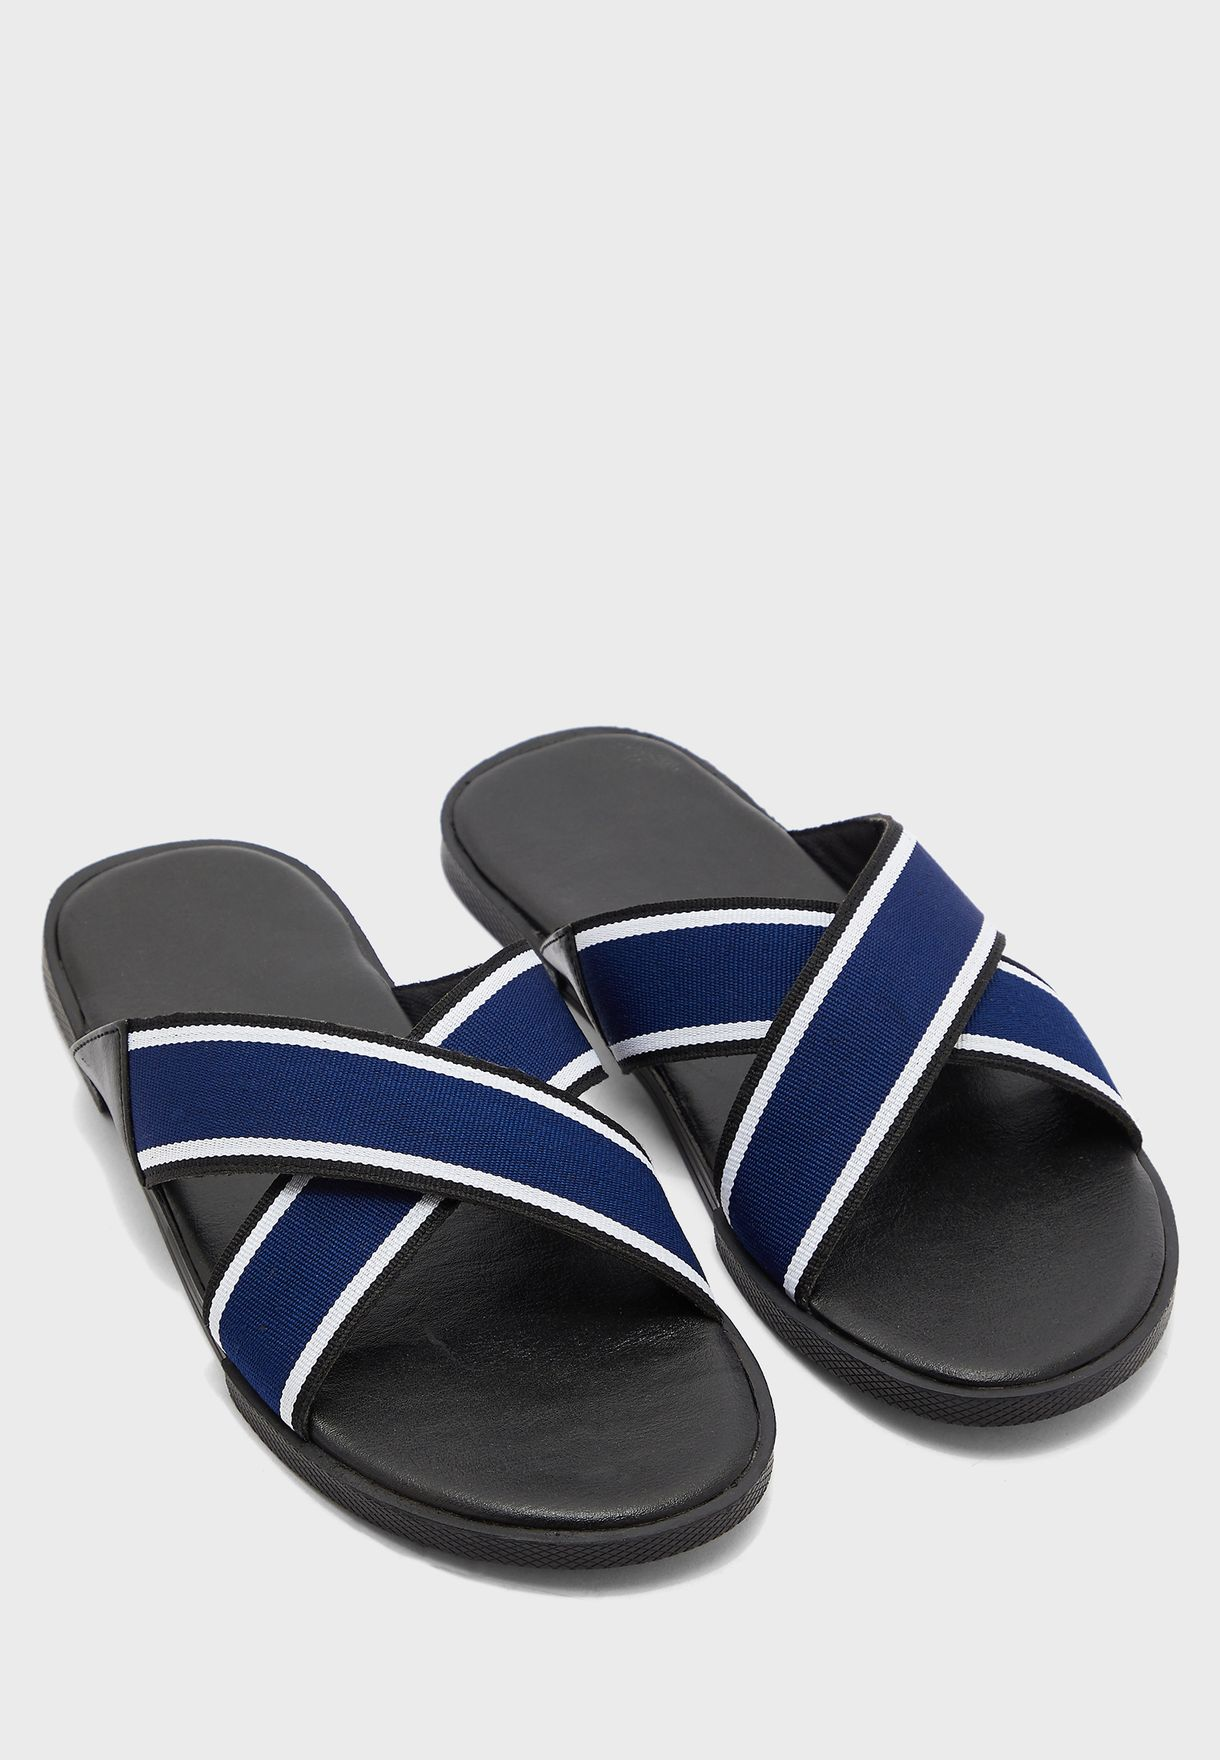 Cross Slides Sandals